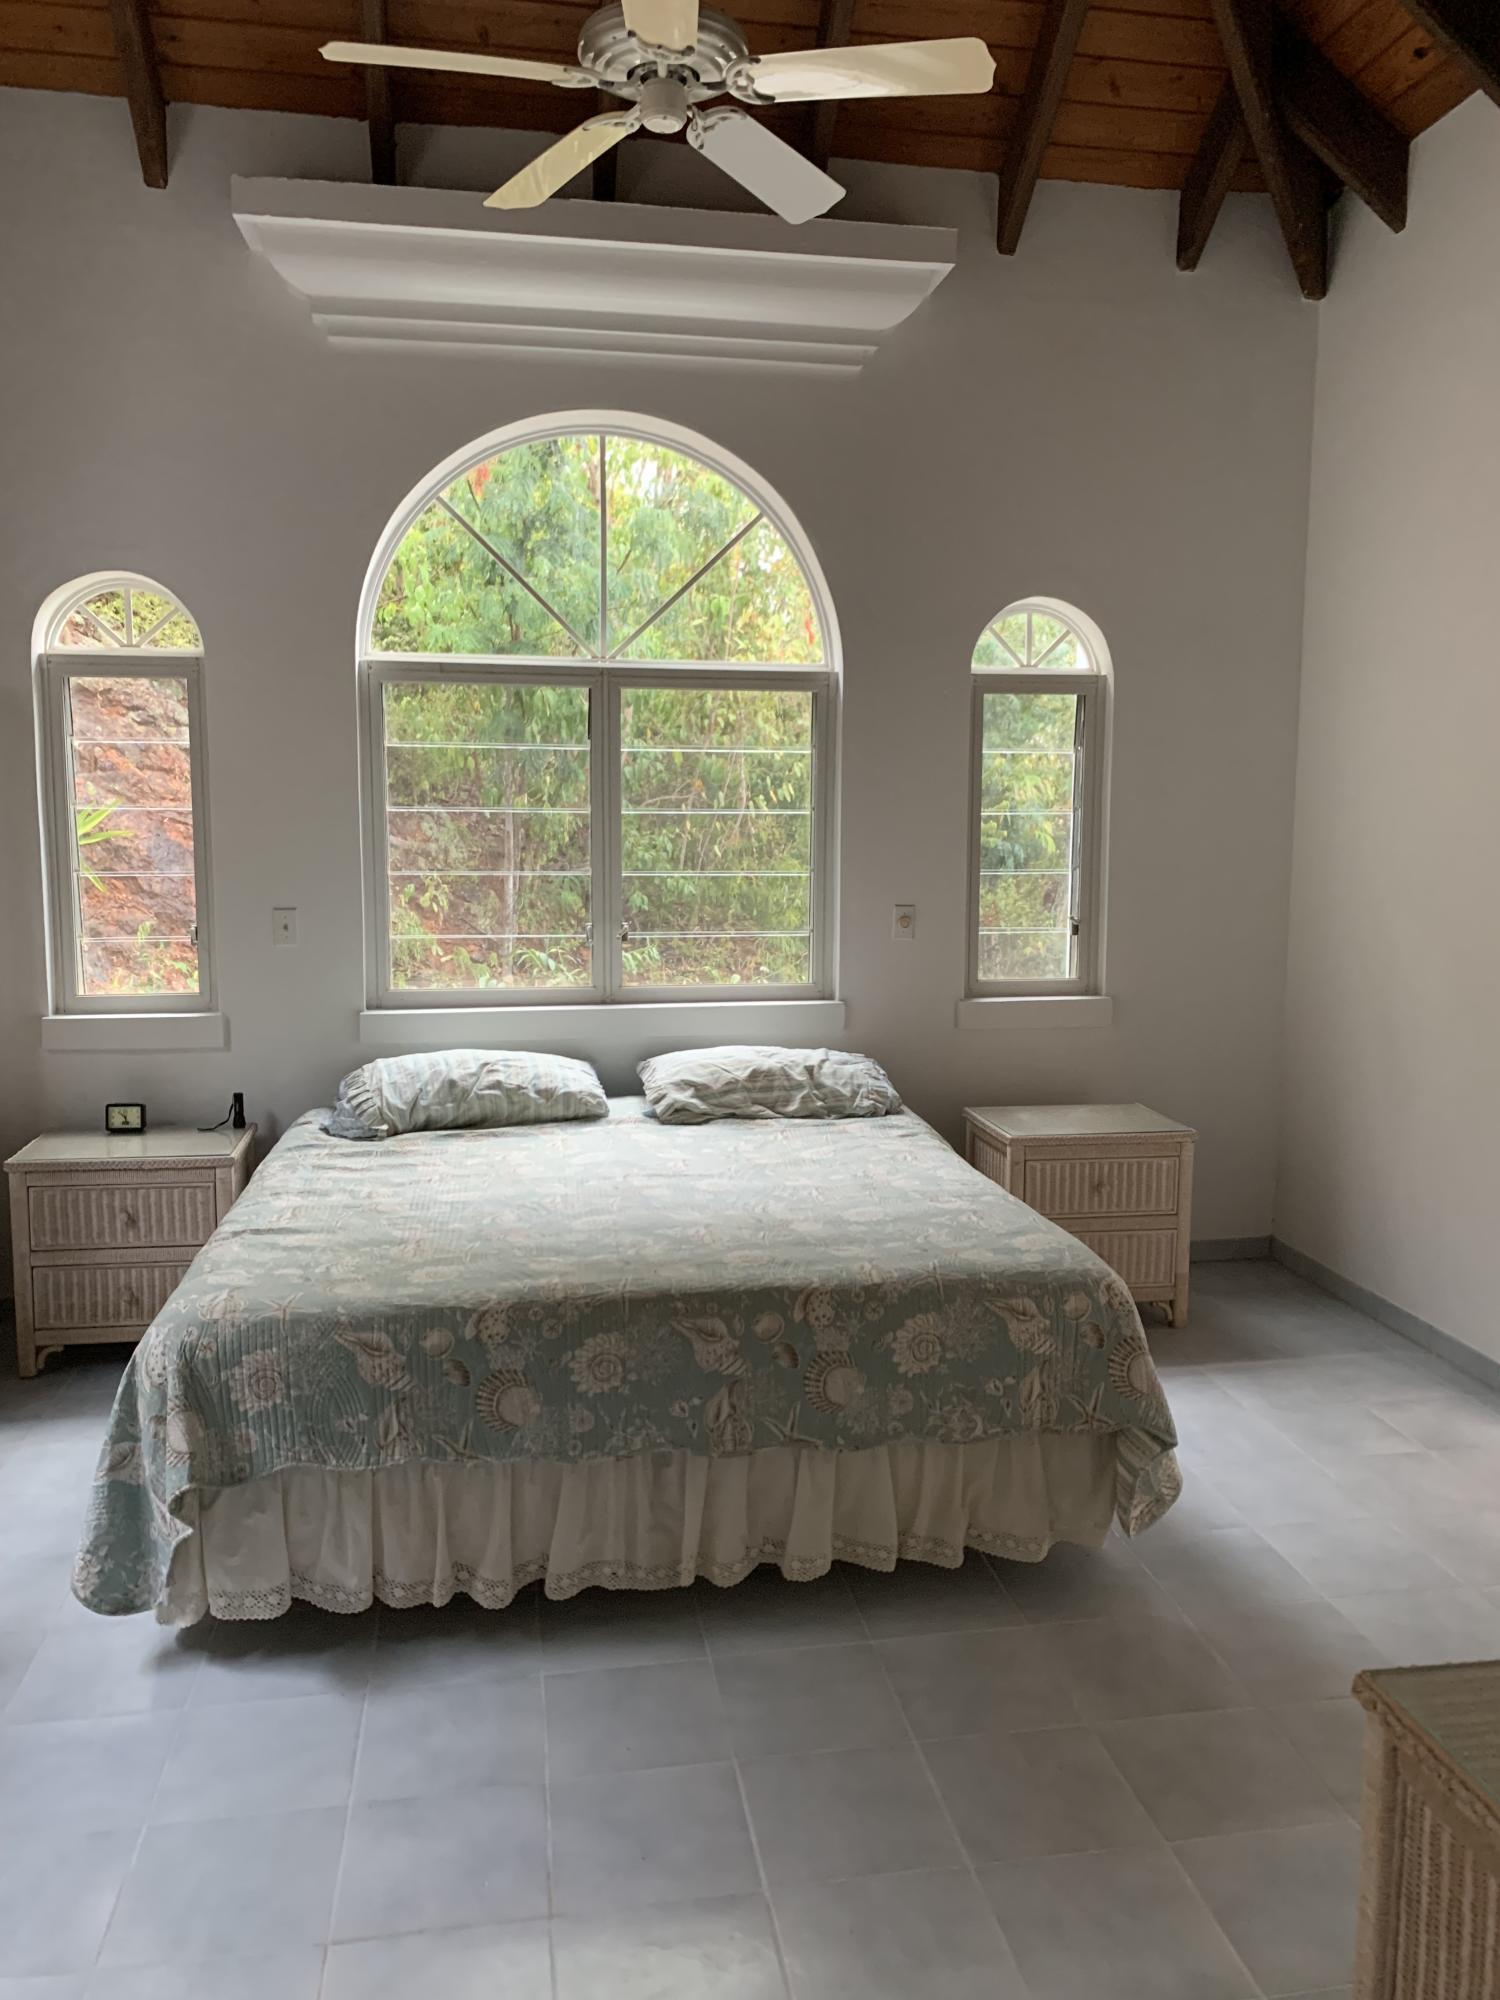 St John, Virgin Islands 00830, 3 Bedrooms Bedrooms, ,2 BathroomsBathrooms,Residential,For Sale,19-188